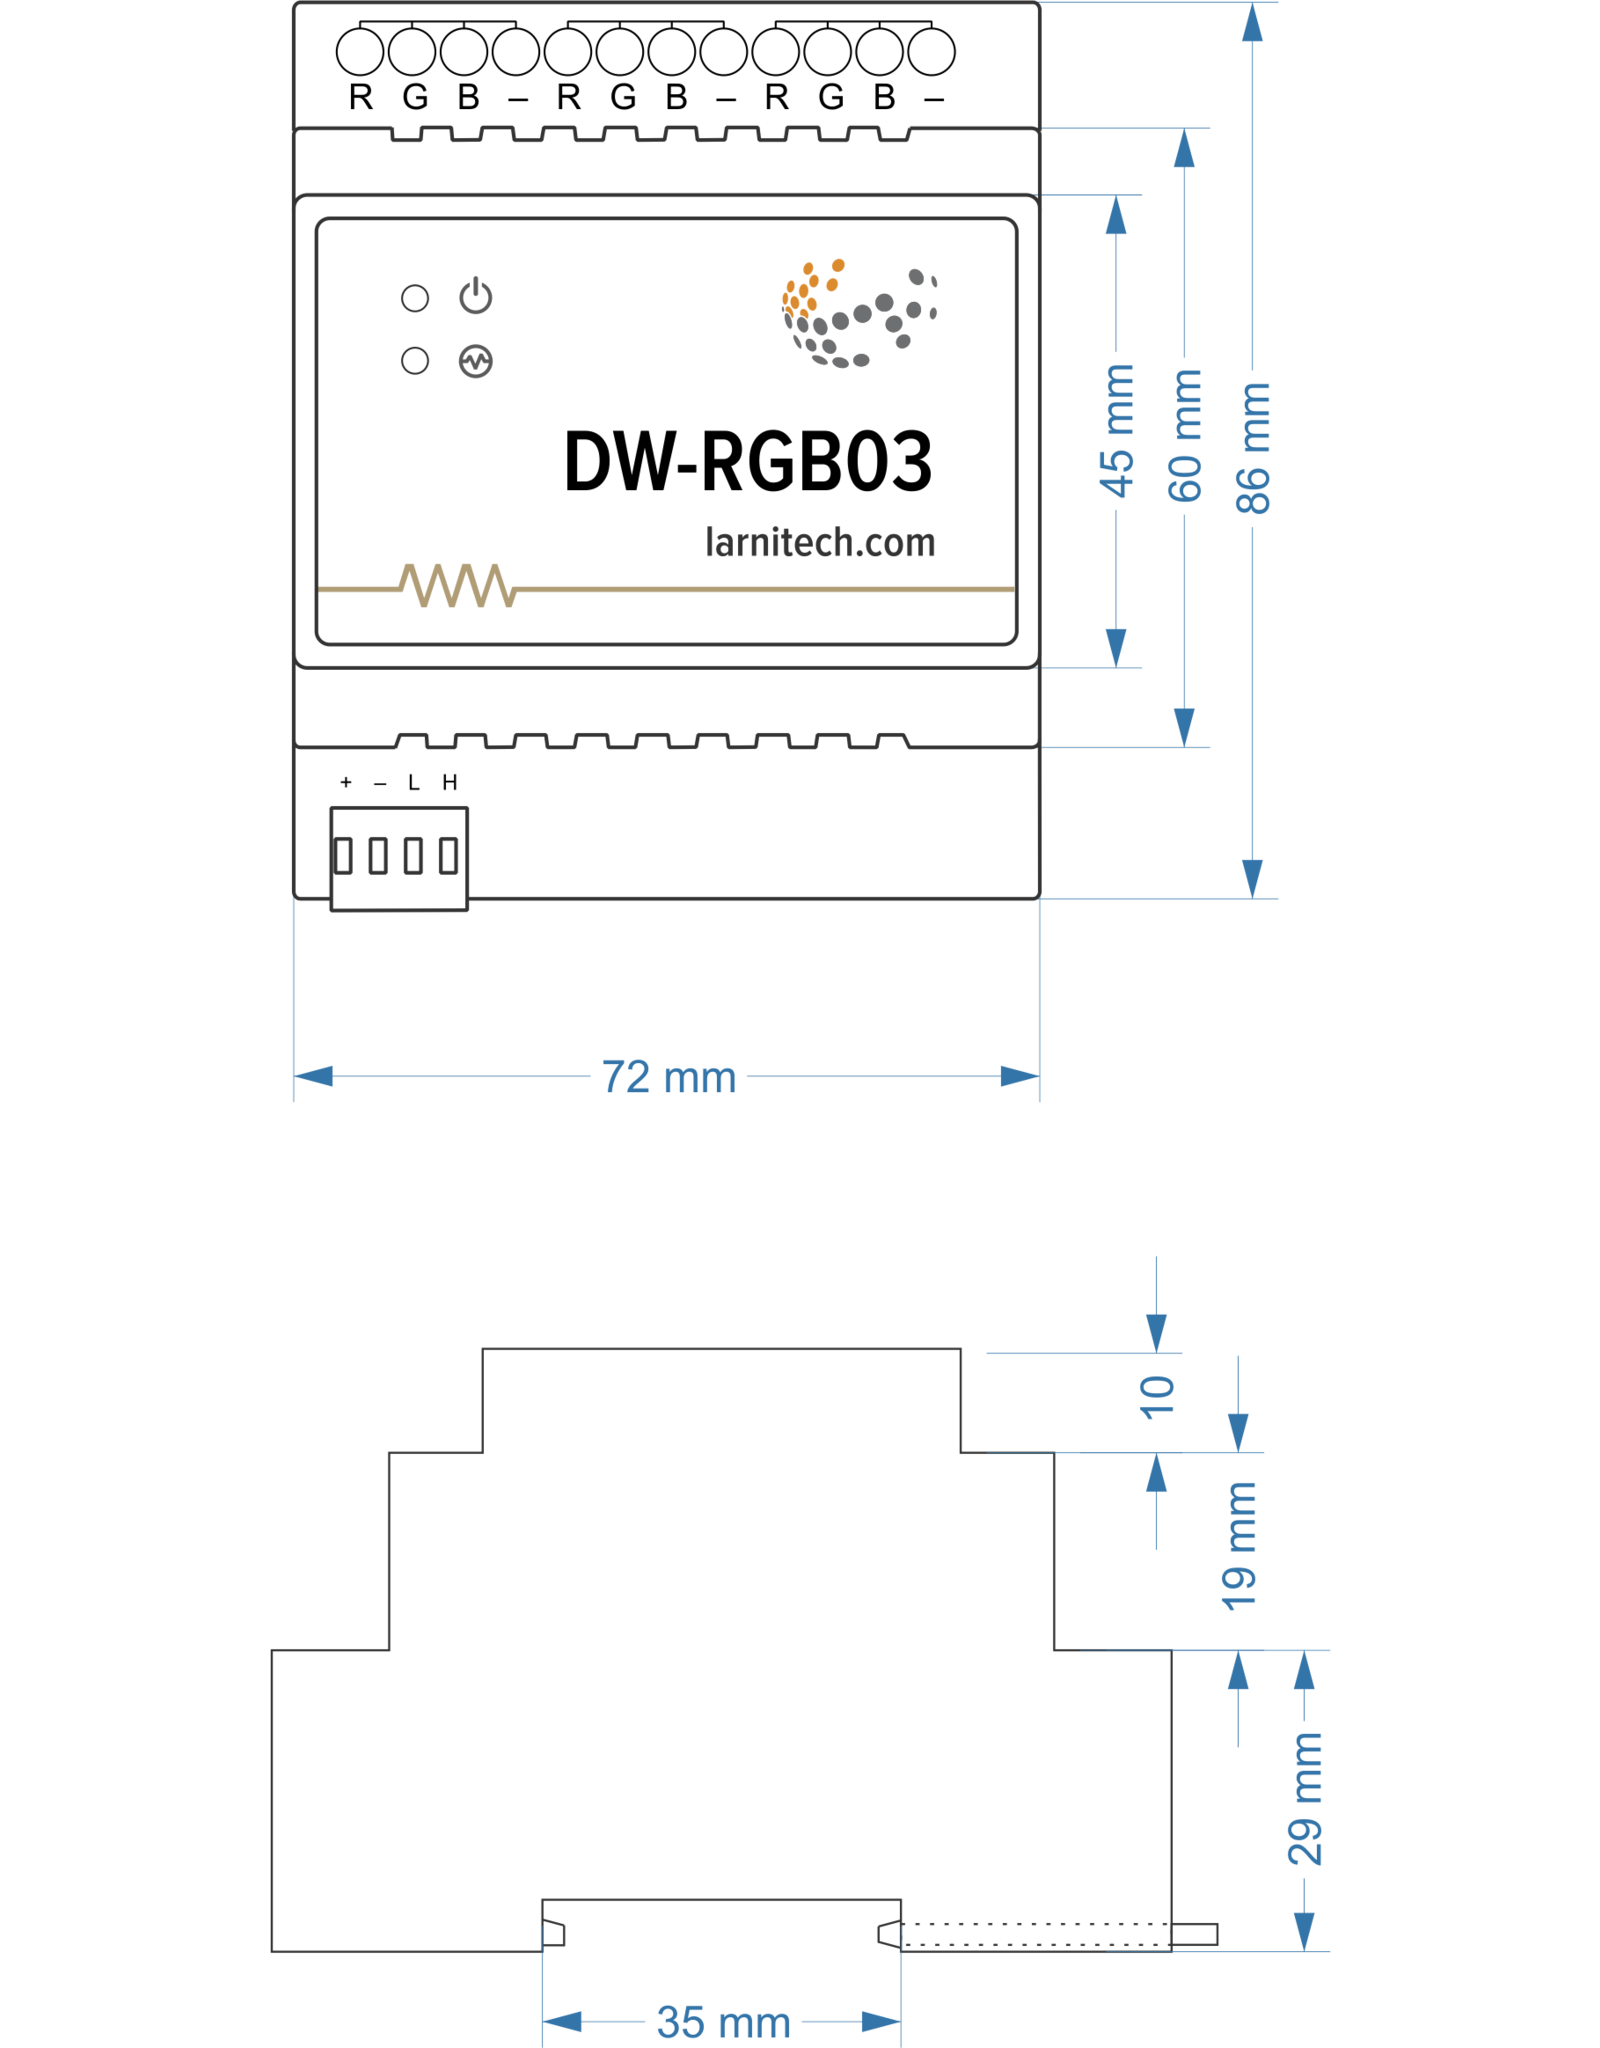 Larnitech DW-RGB03 - 3-kanaals RGB-module (of 9 monochroom kanalen)